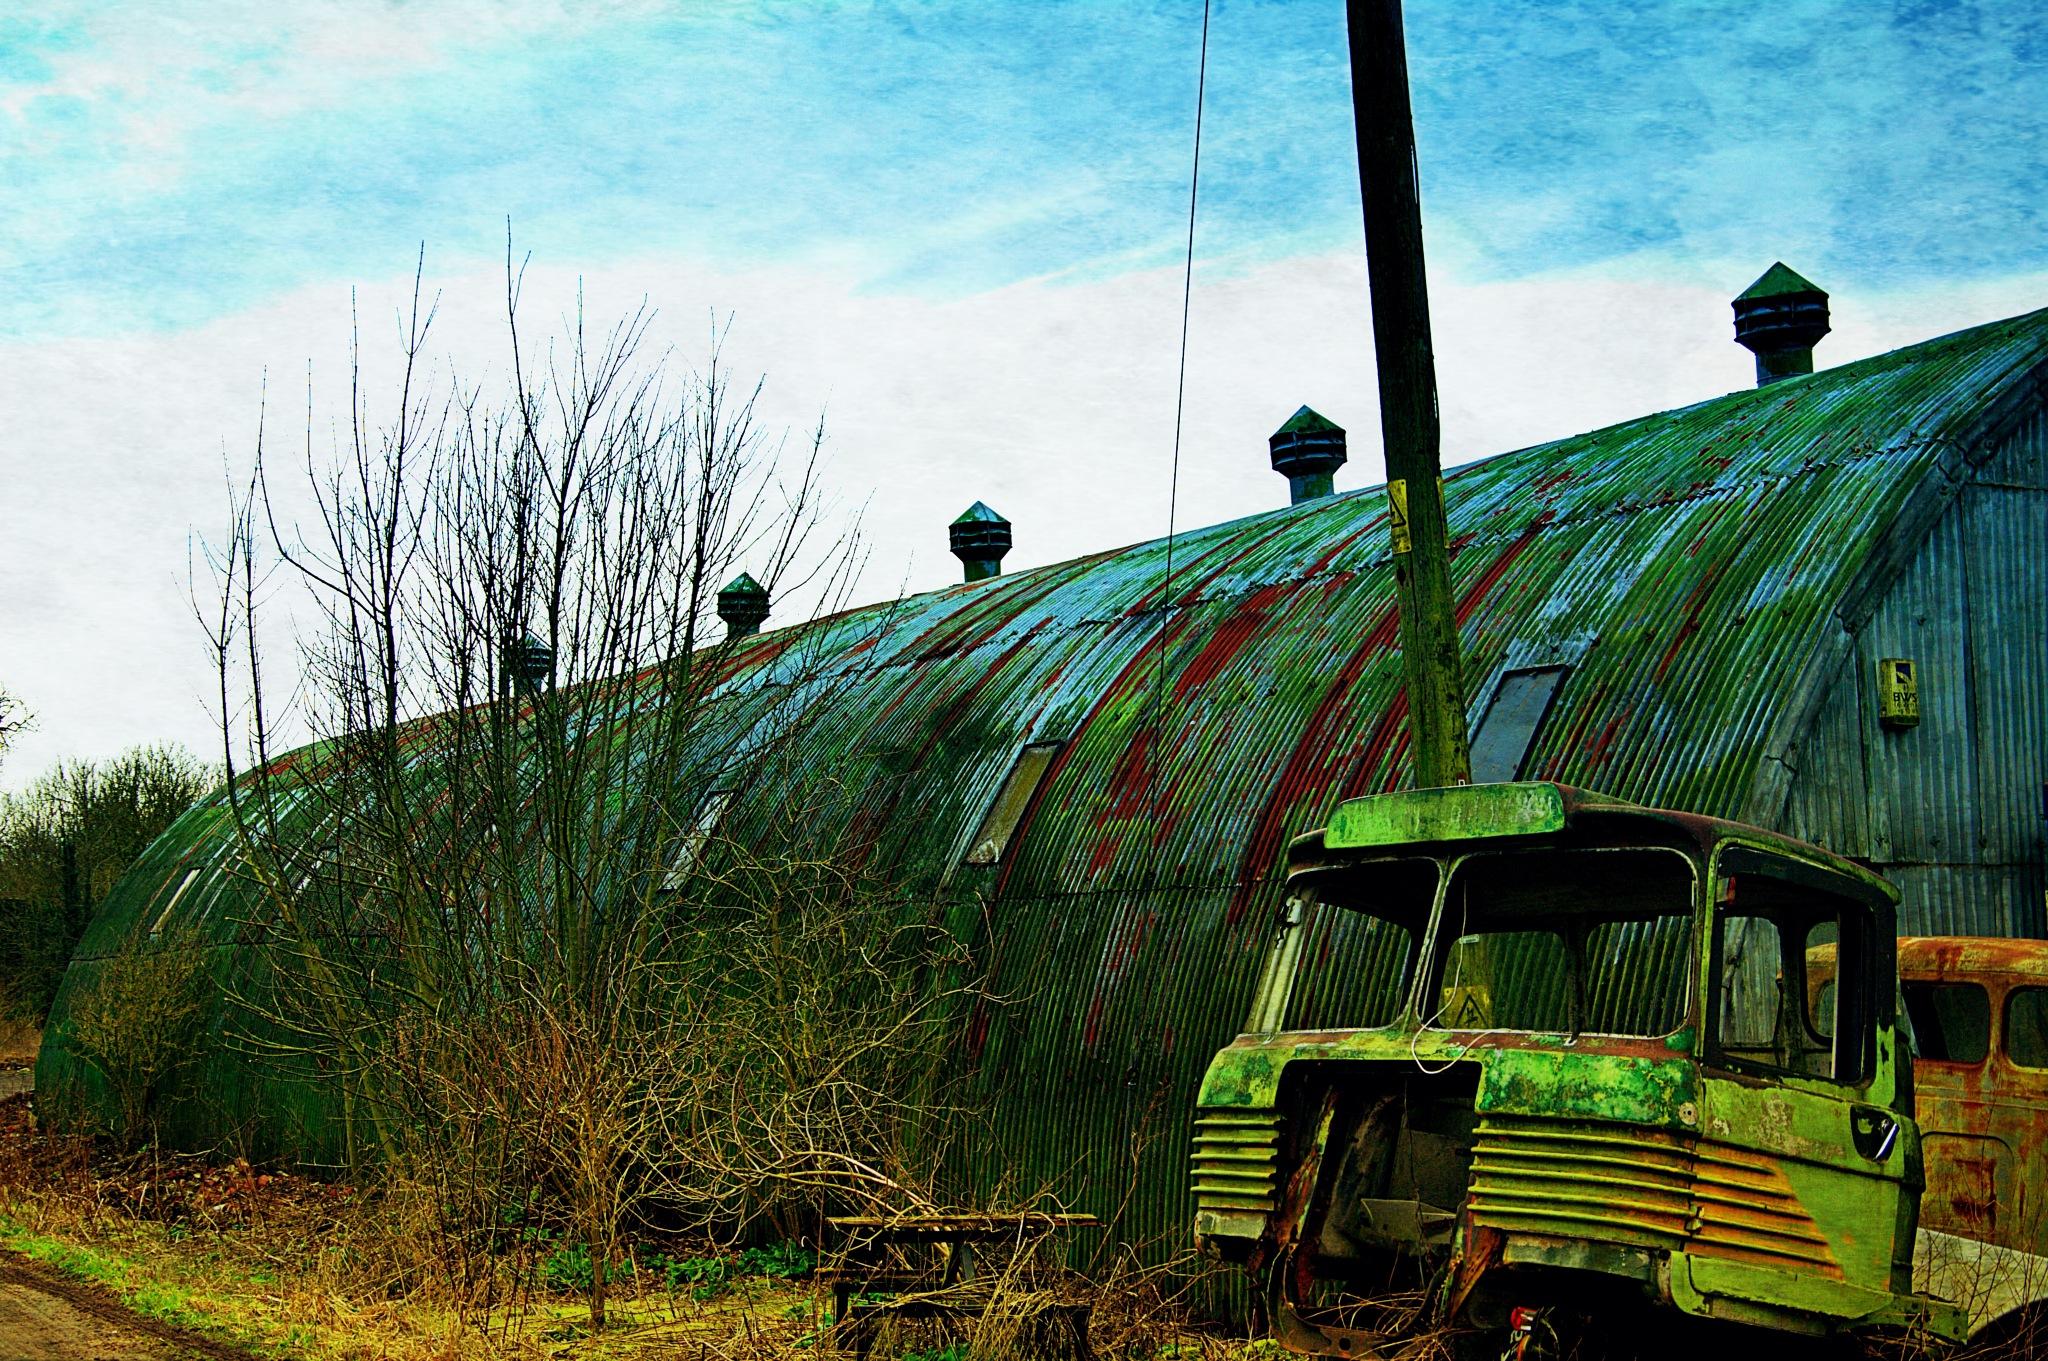 Corrugated Workshop - Upavon by Keith Patrak